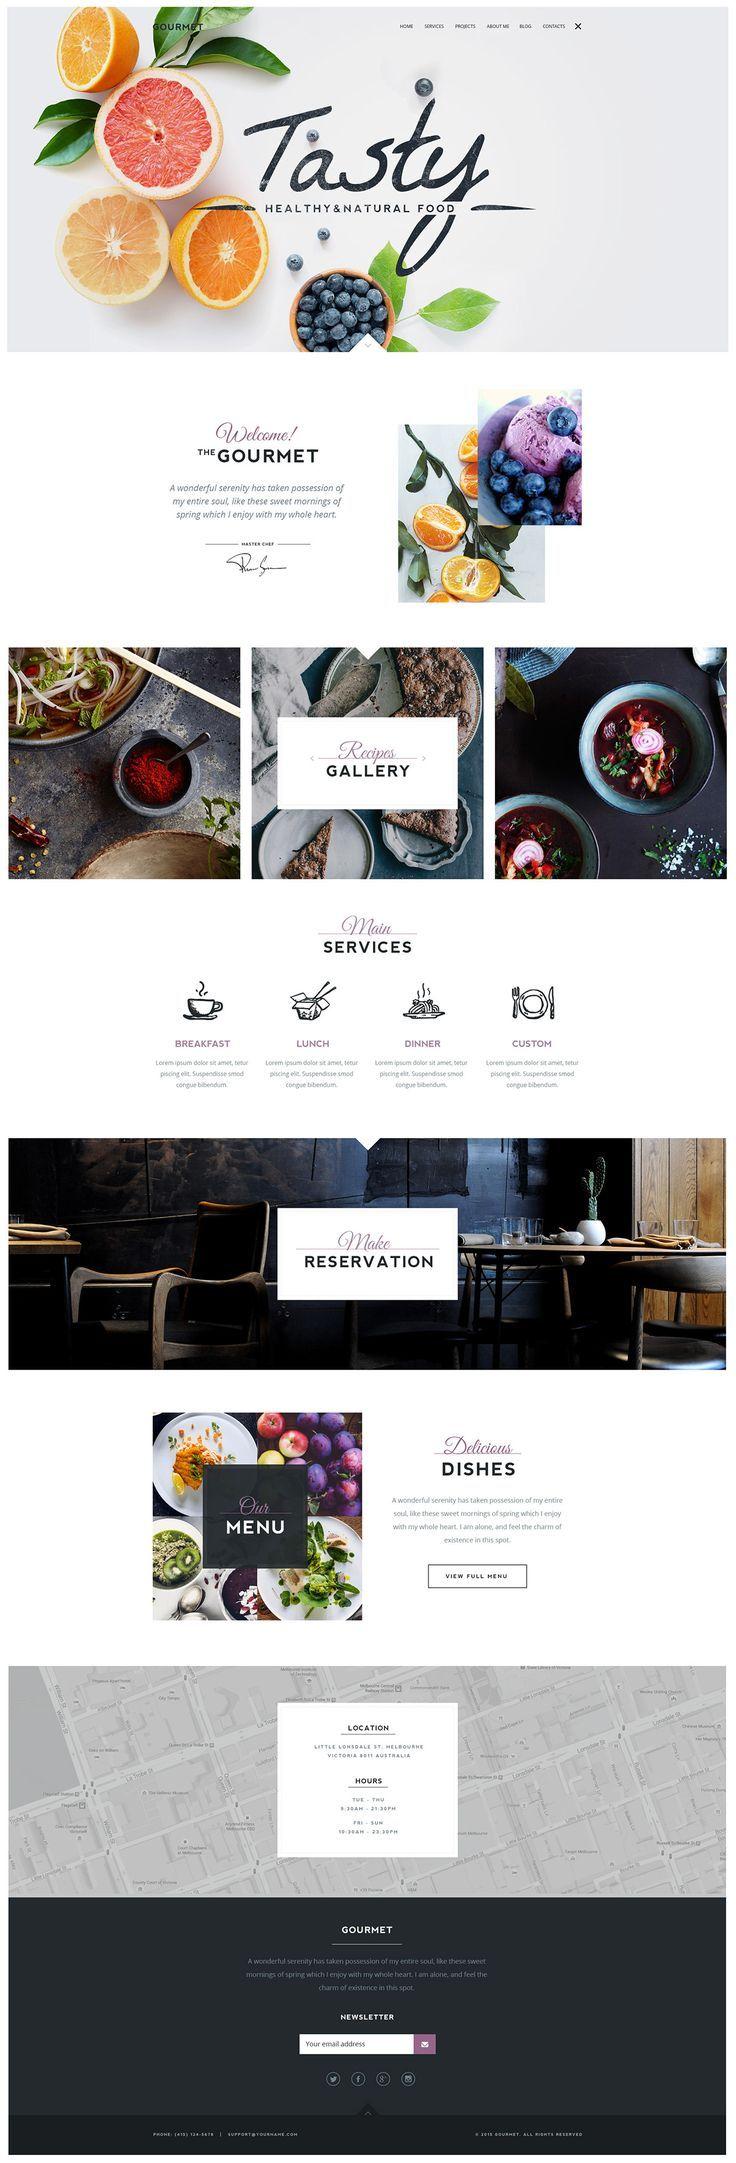 Best 25+ Restaurant website ideas on Pinterest | Restaurant ...